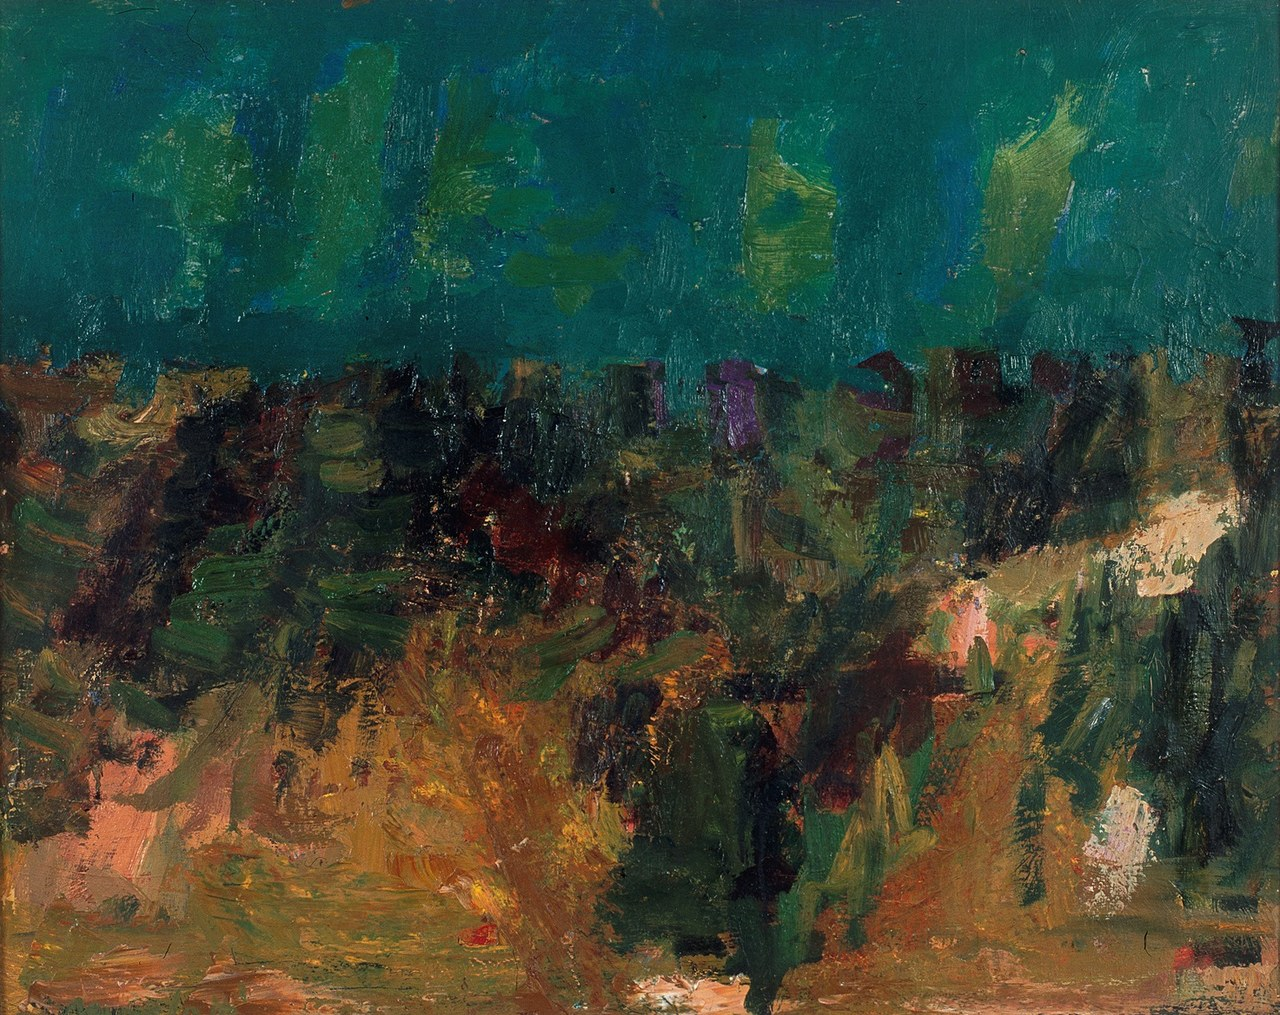 Ennio Morlotti, Paesaggio, 1955, MAGA, Gallarate